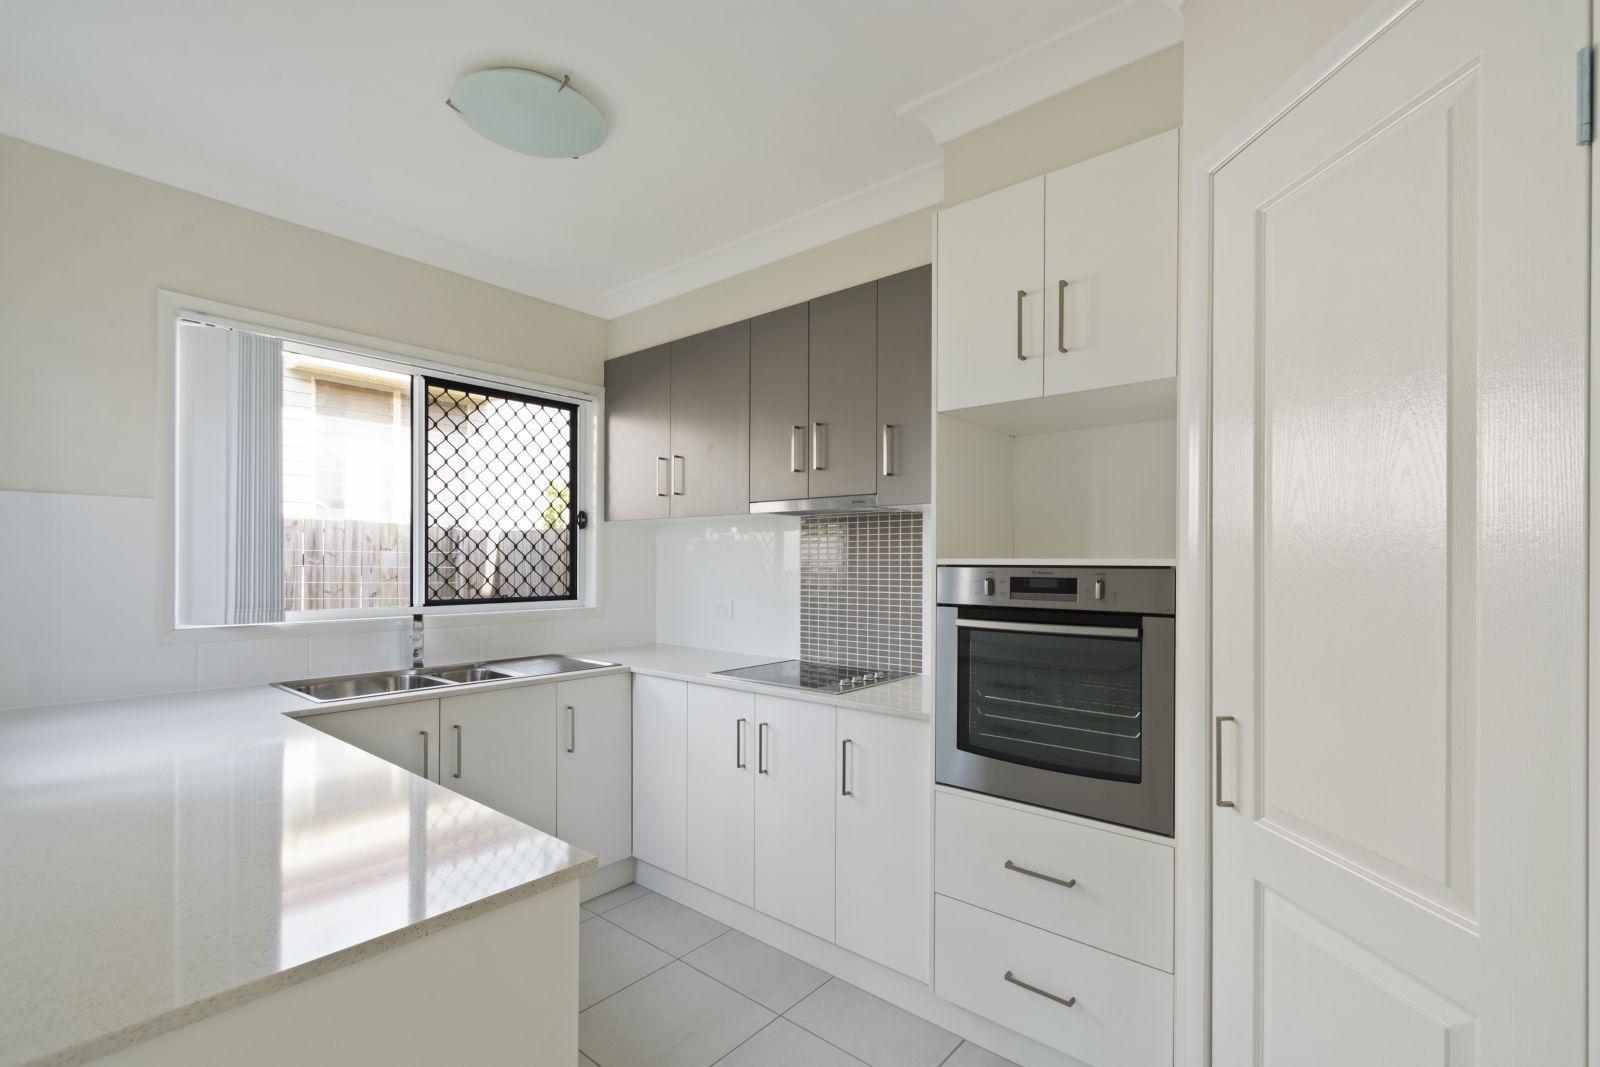 6/11 O'Brien Street, Toowoomba QLD 4350, Image 1